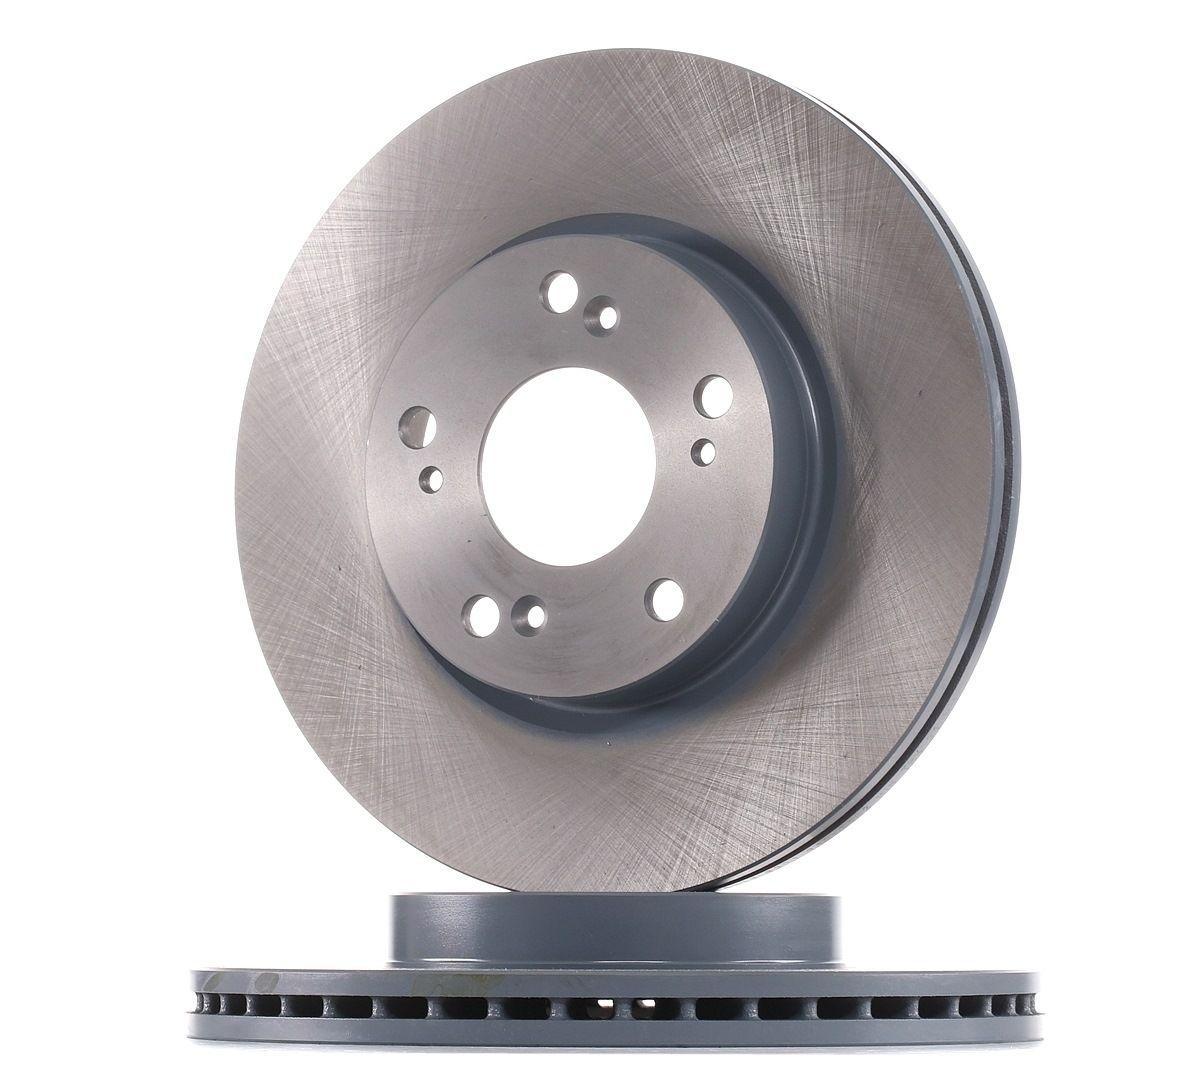 31399 FEBI BILSTEIN Front Axle, Internally Vented, Coated Ø: 282,0mm, Brake Disc Thickness: 23mm Brake Disc 31399 cheap